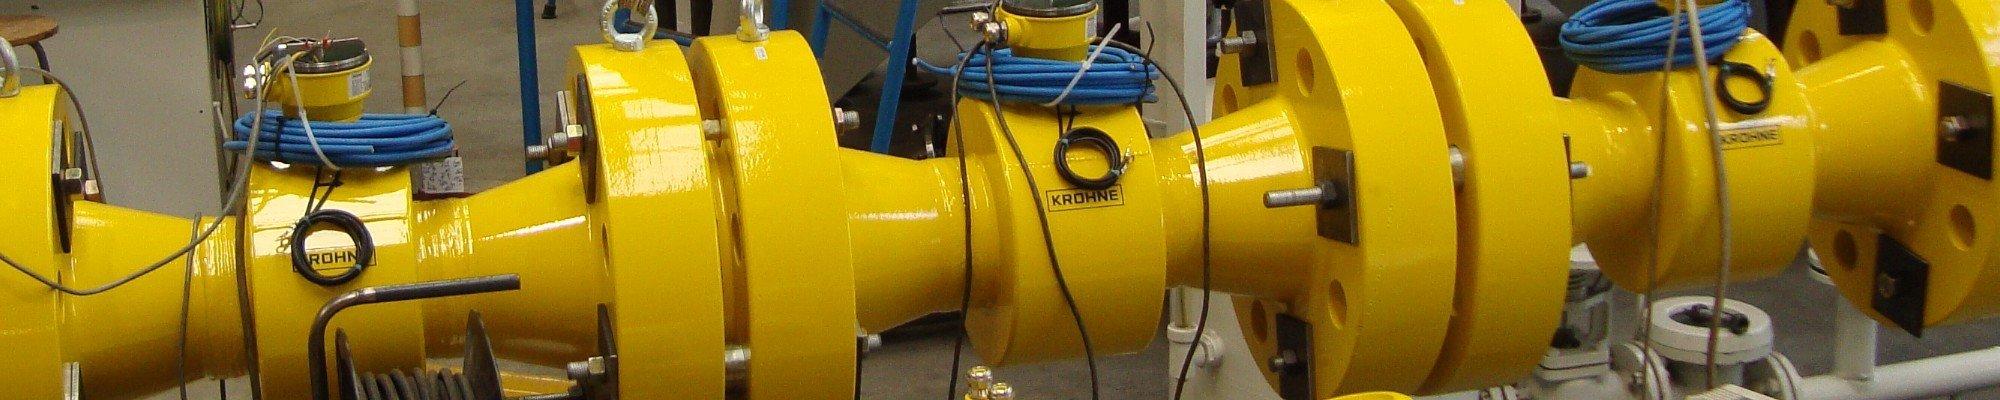 ODS repareert alle merken flowmeters.